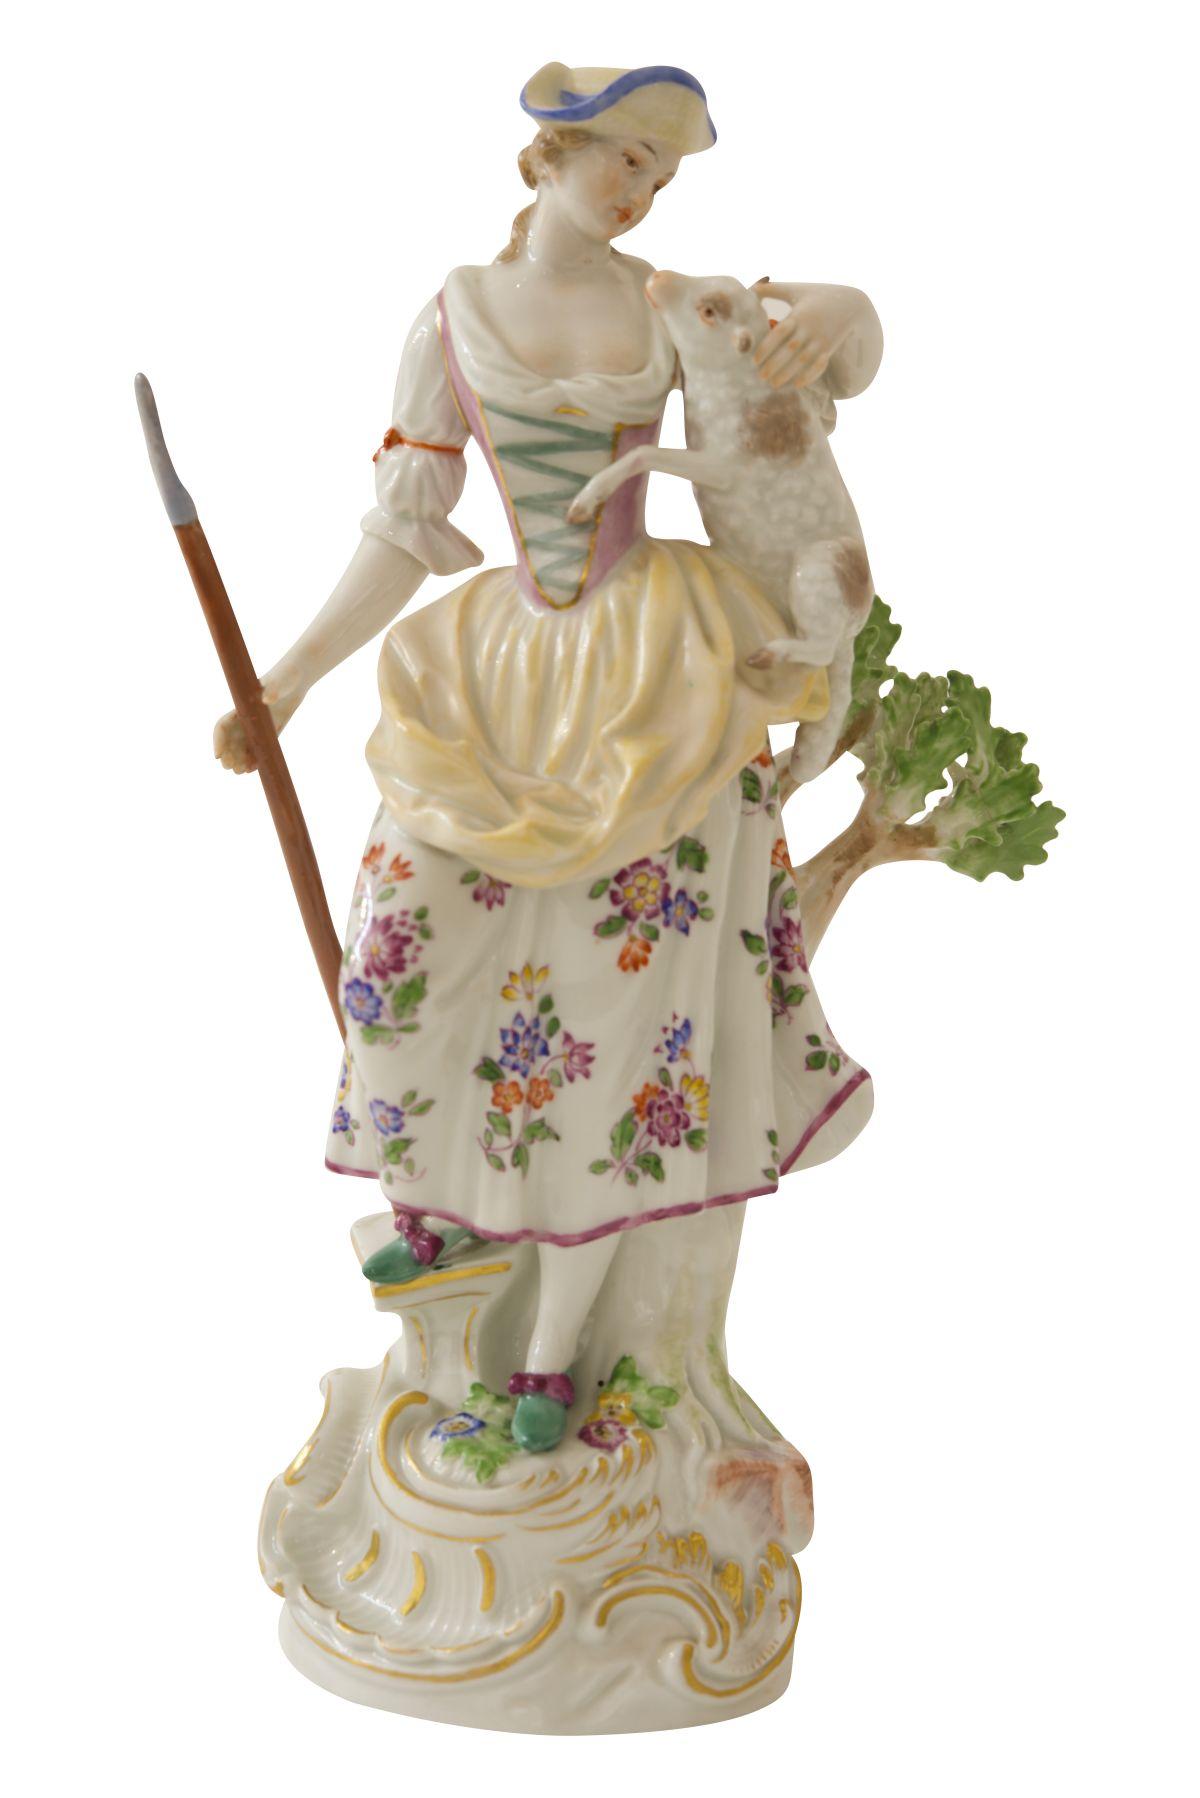 "#84 Large figure ""shepherdess"" Meissen | Große Figur ""Schäferin"" Meisen Image"